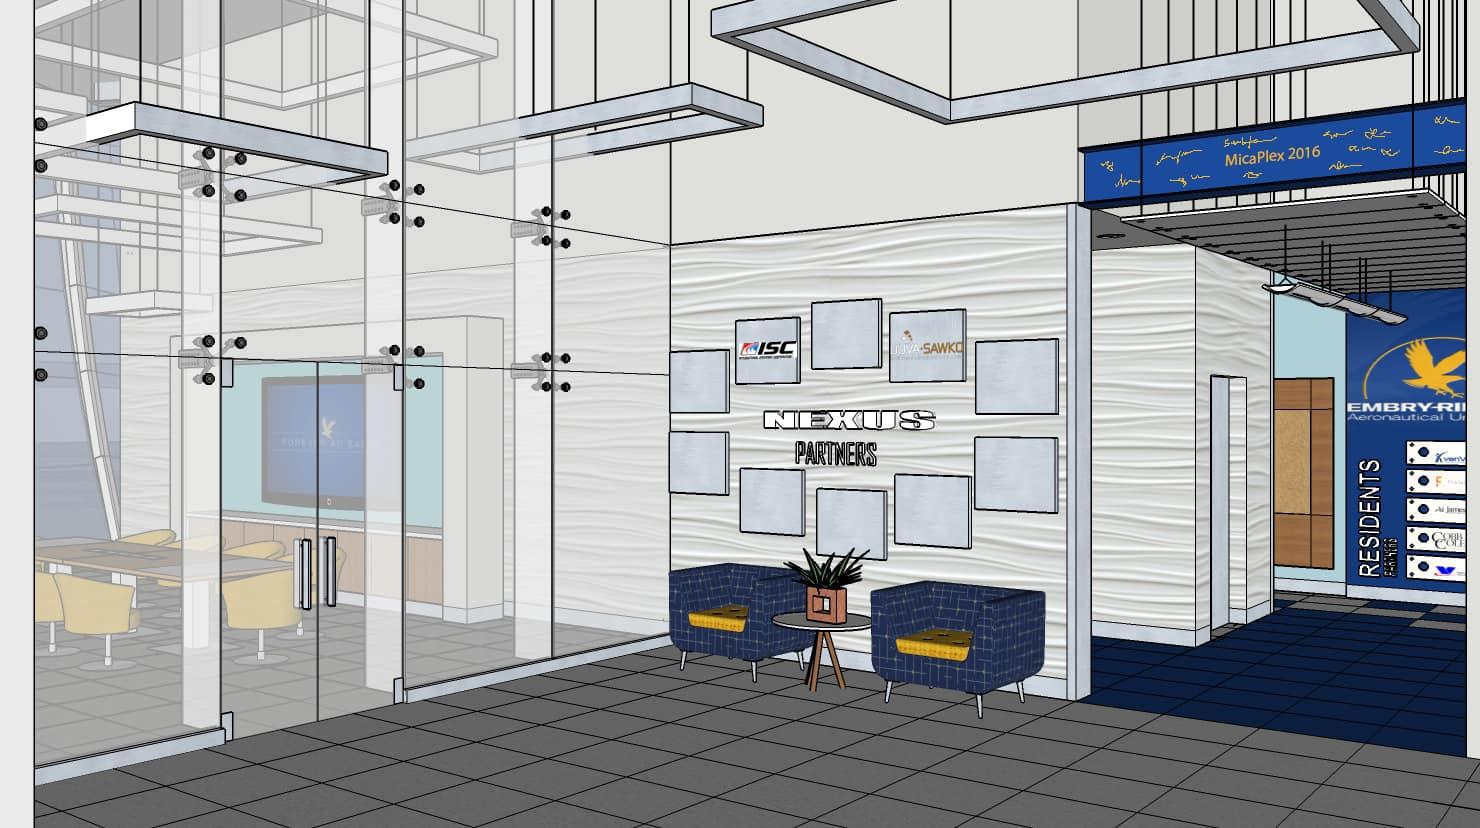 Micaplex Lobby Interior